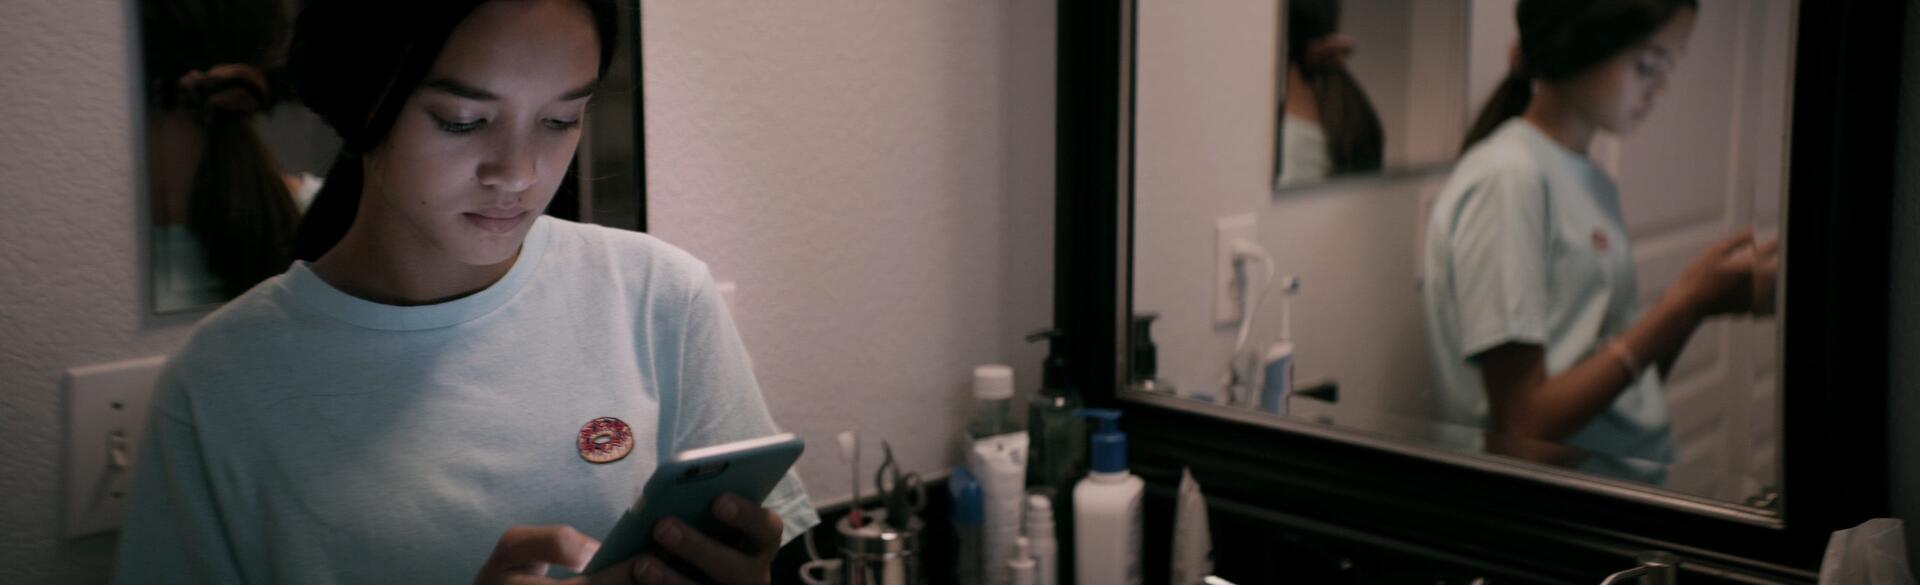 Still frame from the Netflix documentary 'The Social Dilemma'